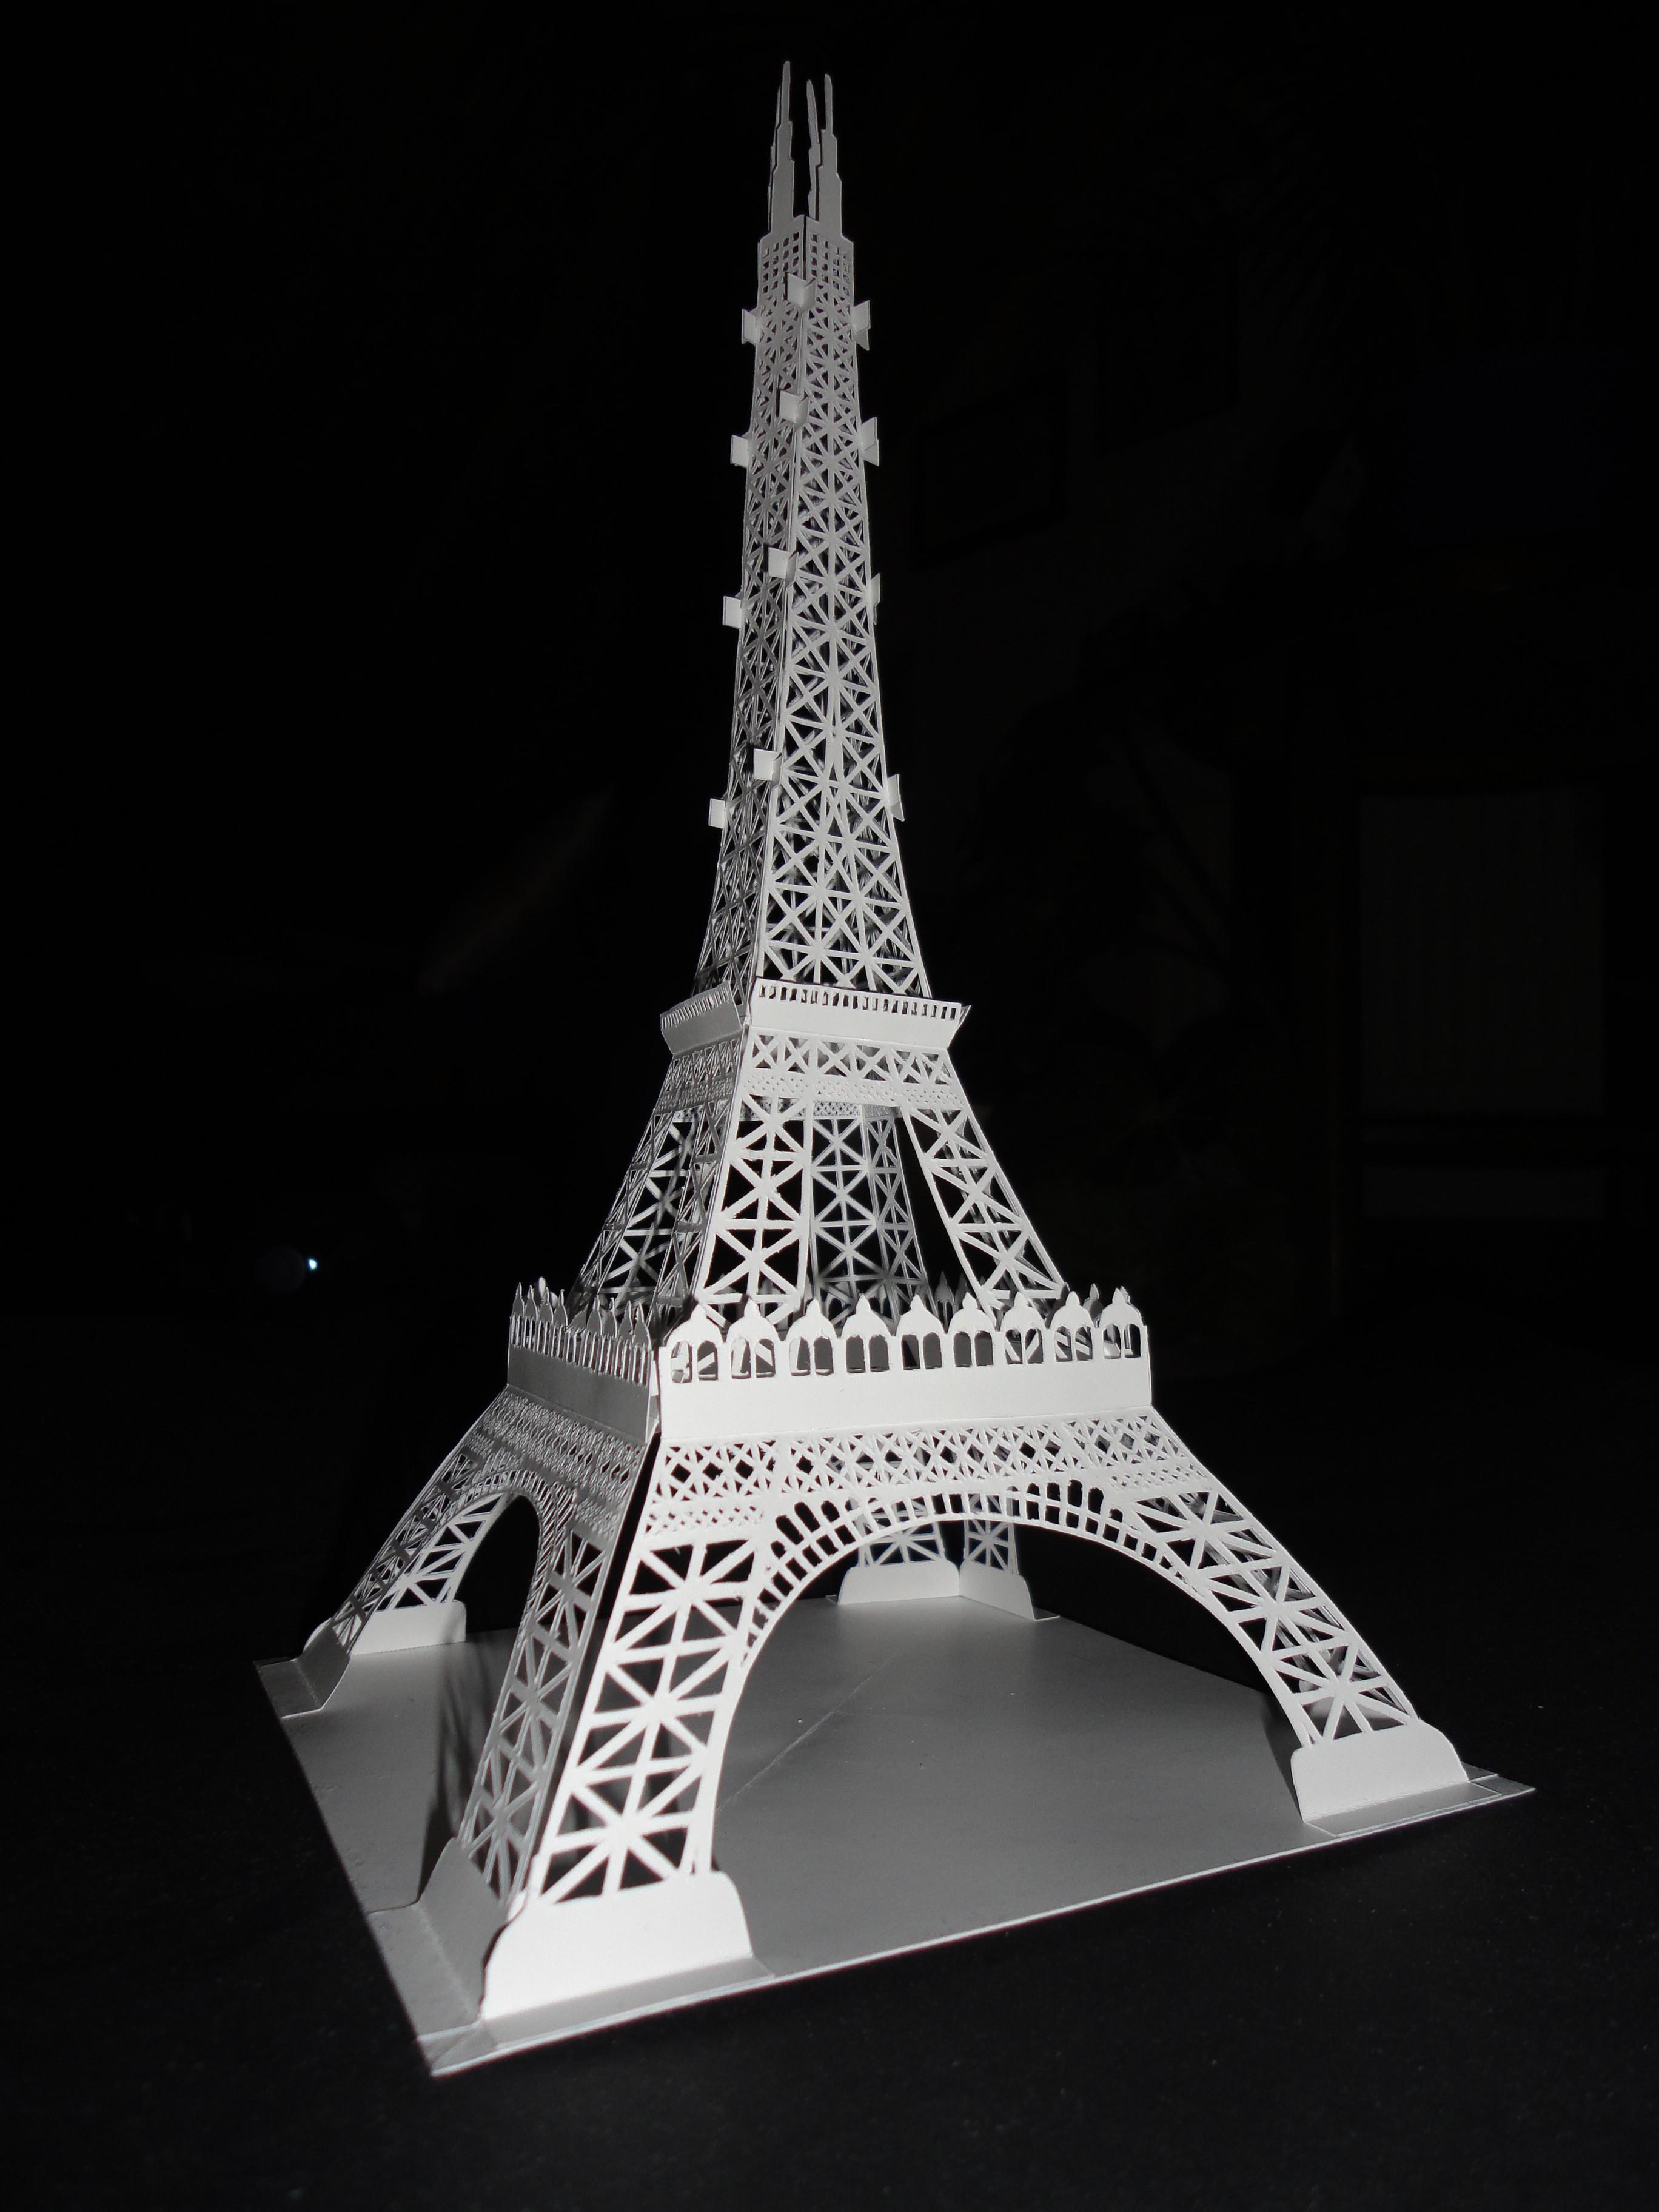 Eiffel Tower by Luyomi333